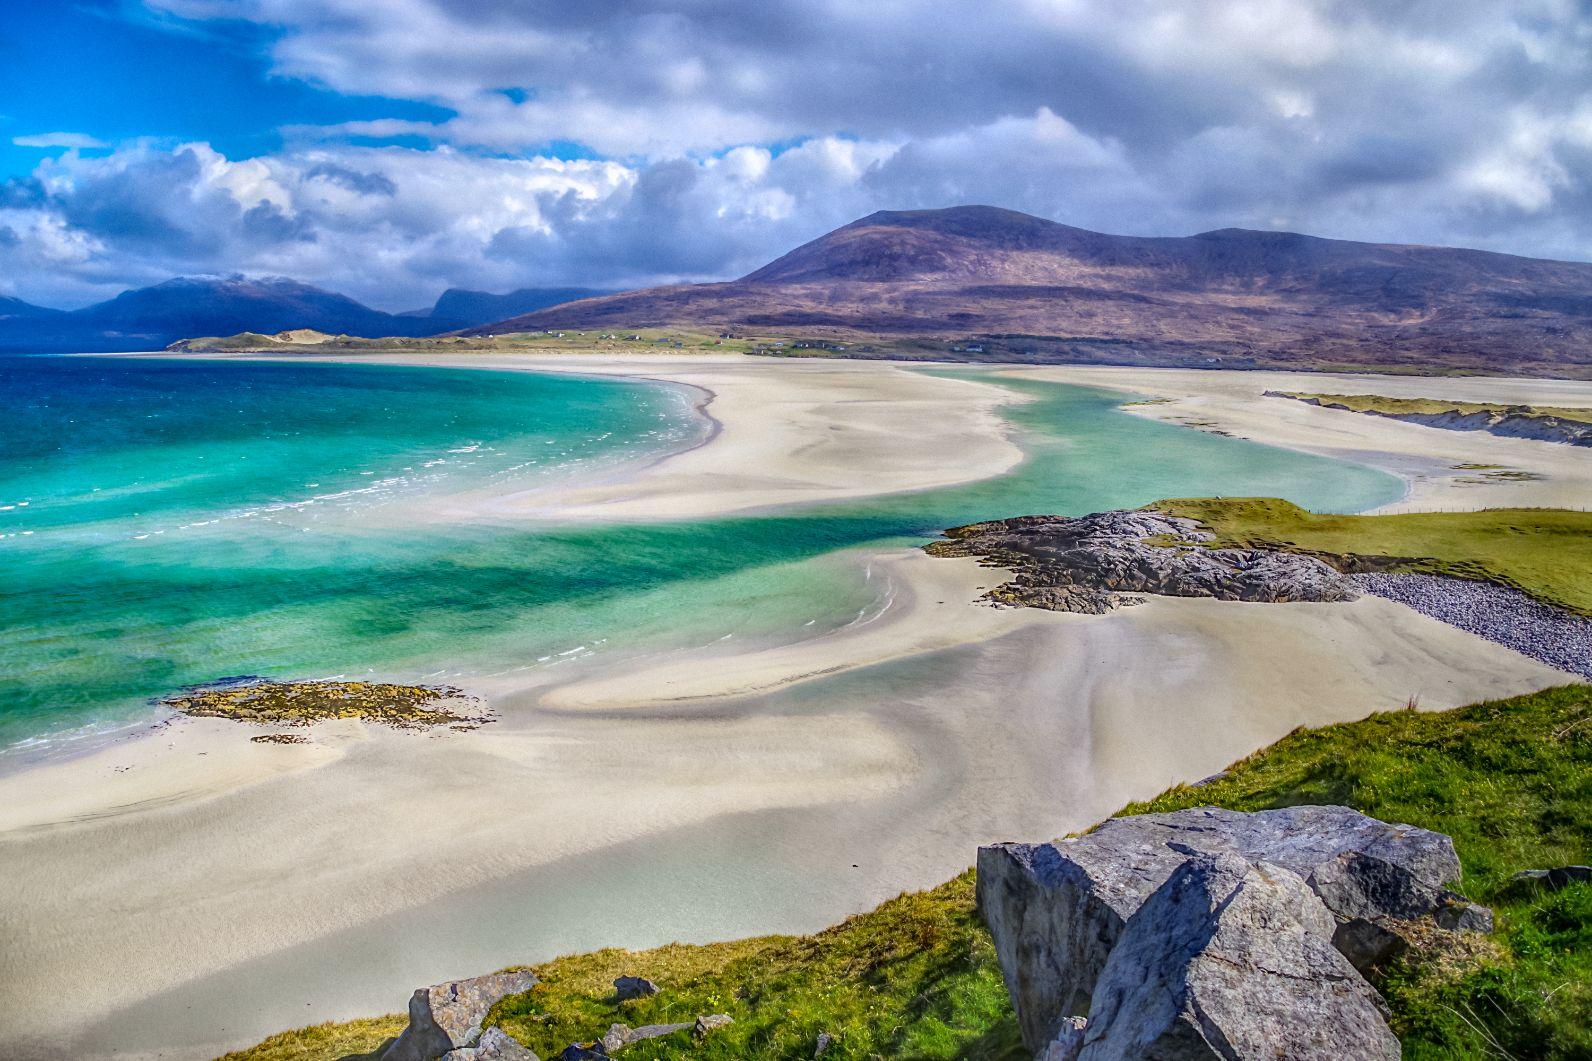 Plavba po řece Rhapti